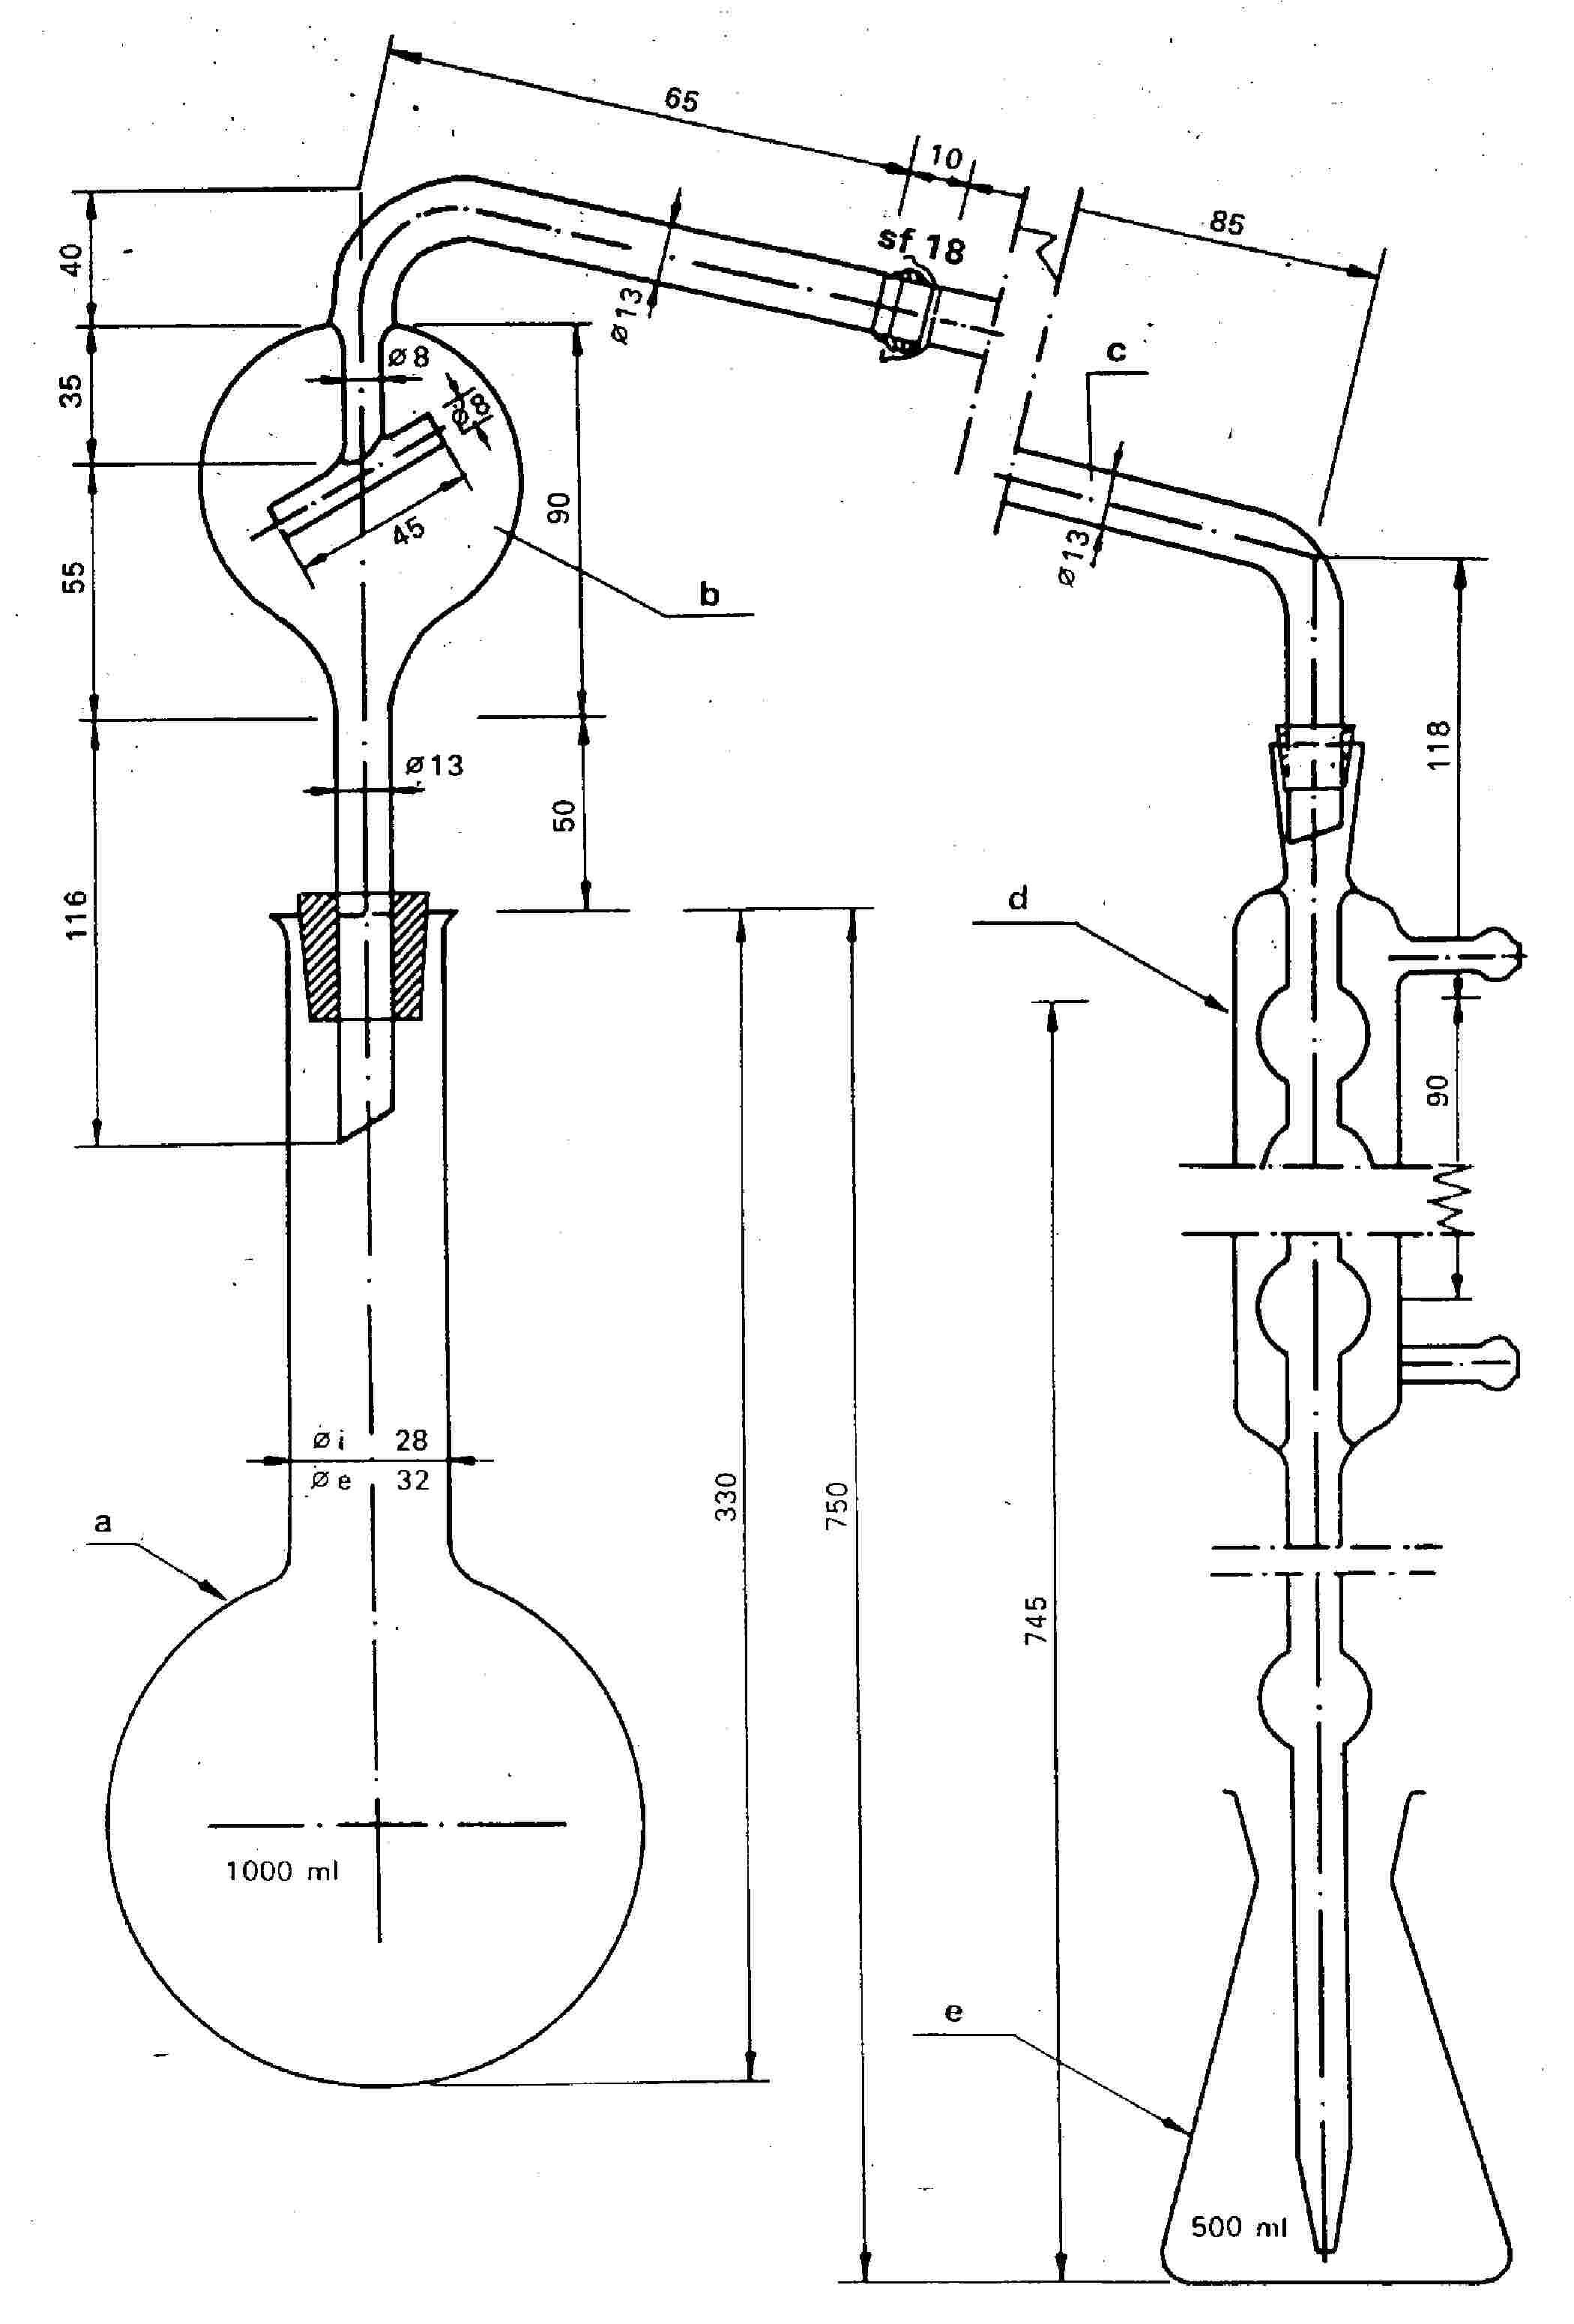 Eur Lex 02003r2003 20041224 En 220 Volt Welder Plug Likewise 50 Besides Wiring Diagram Image